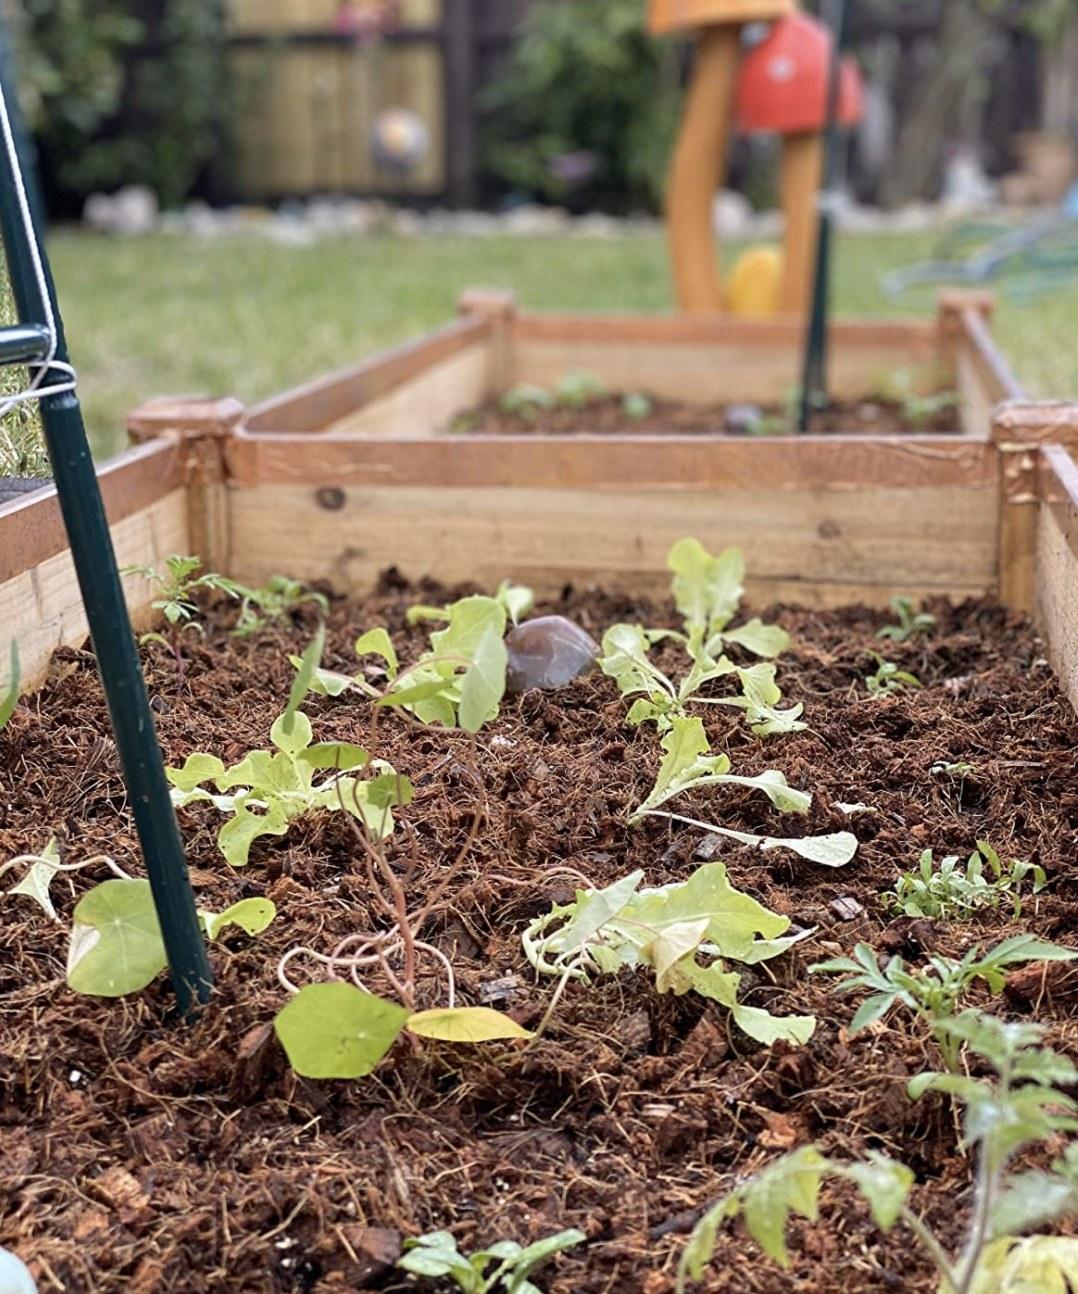 mulch spread over a garden bed